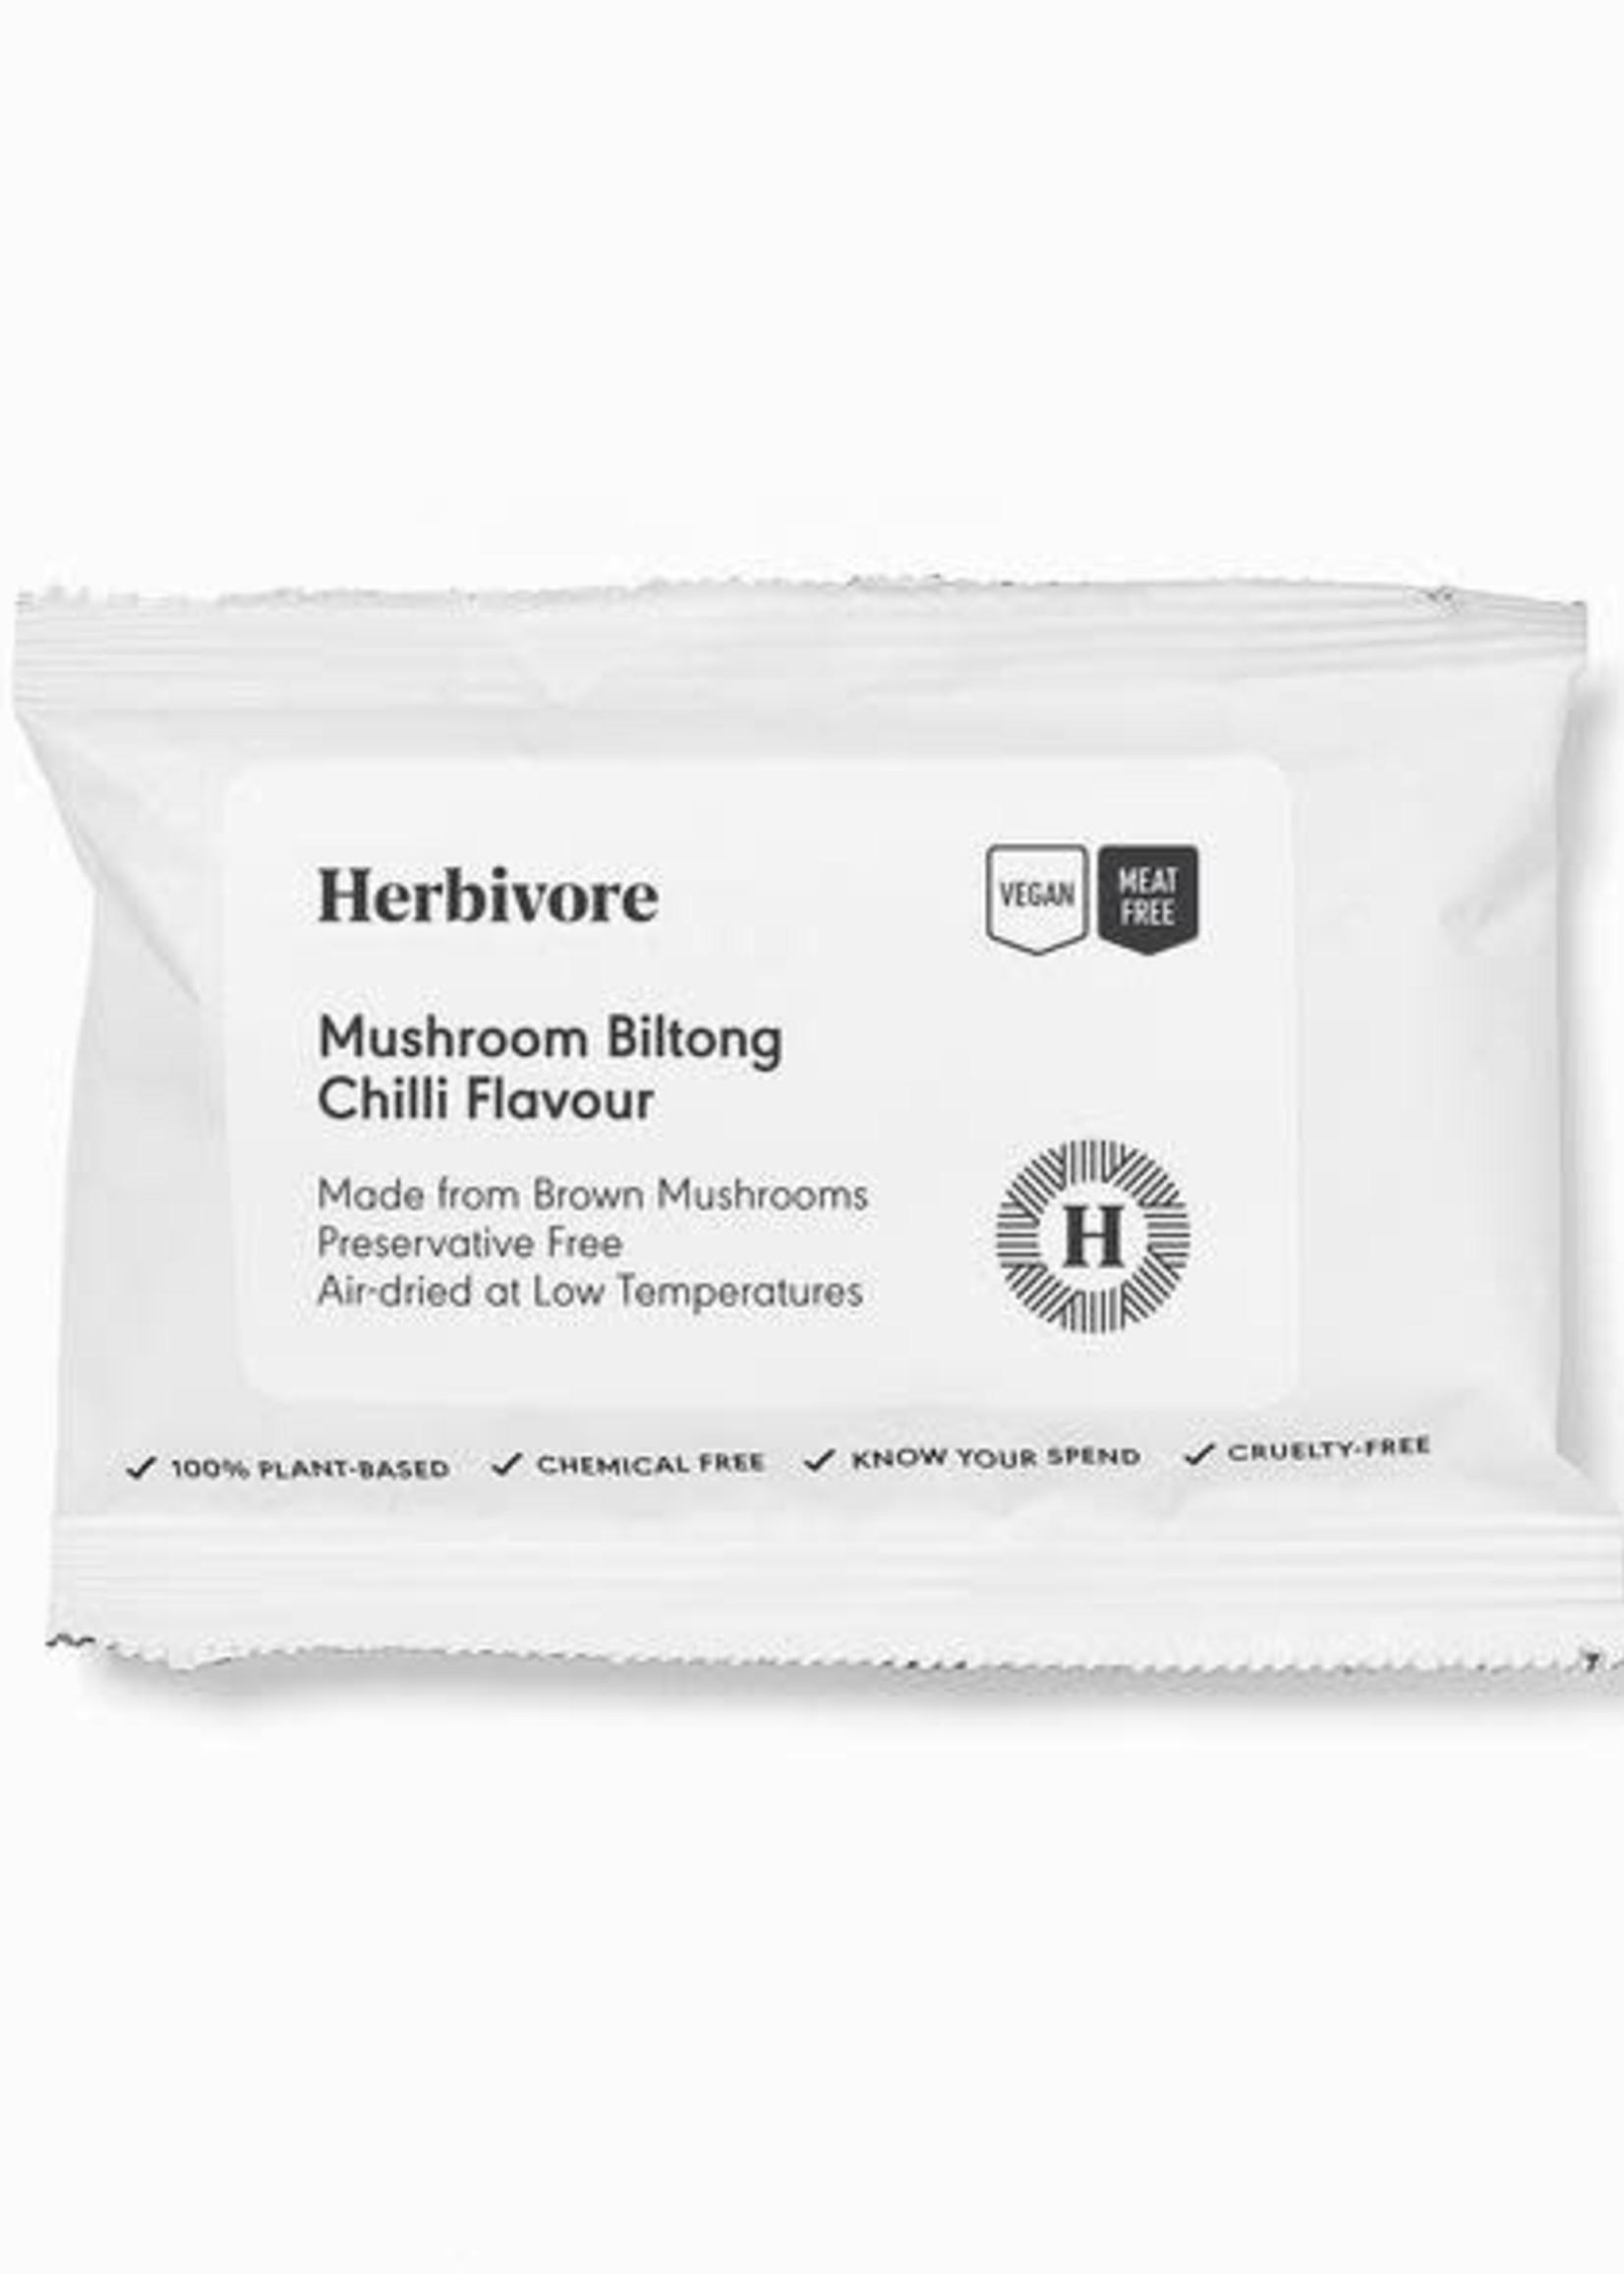 Herbivore - Mushroom Biltong chilli flavour